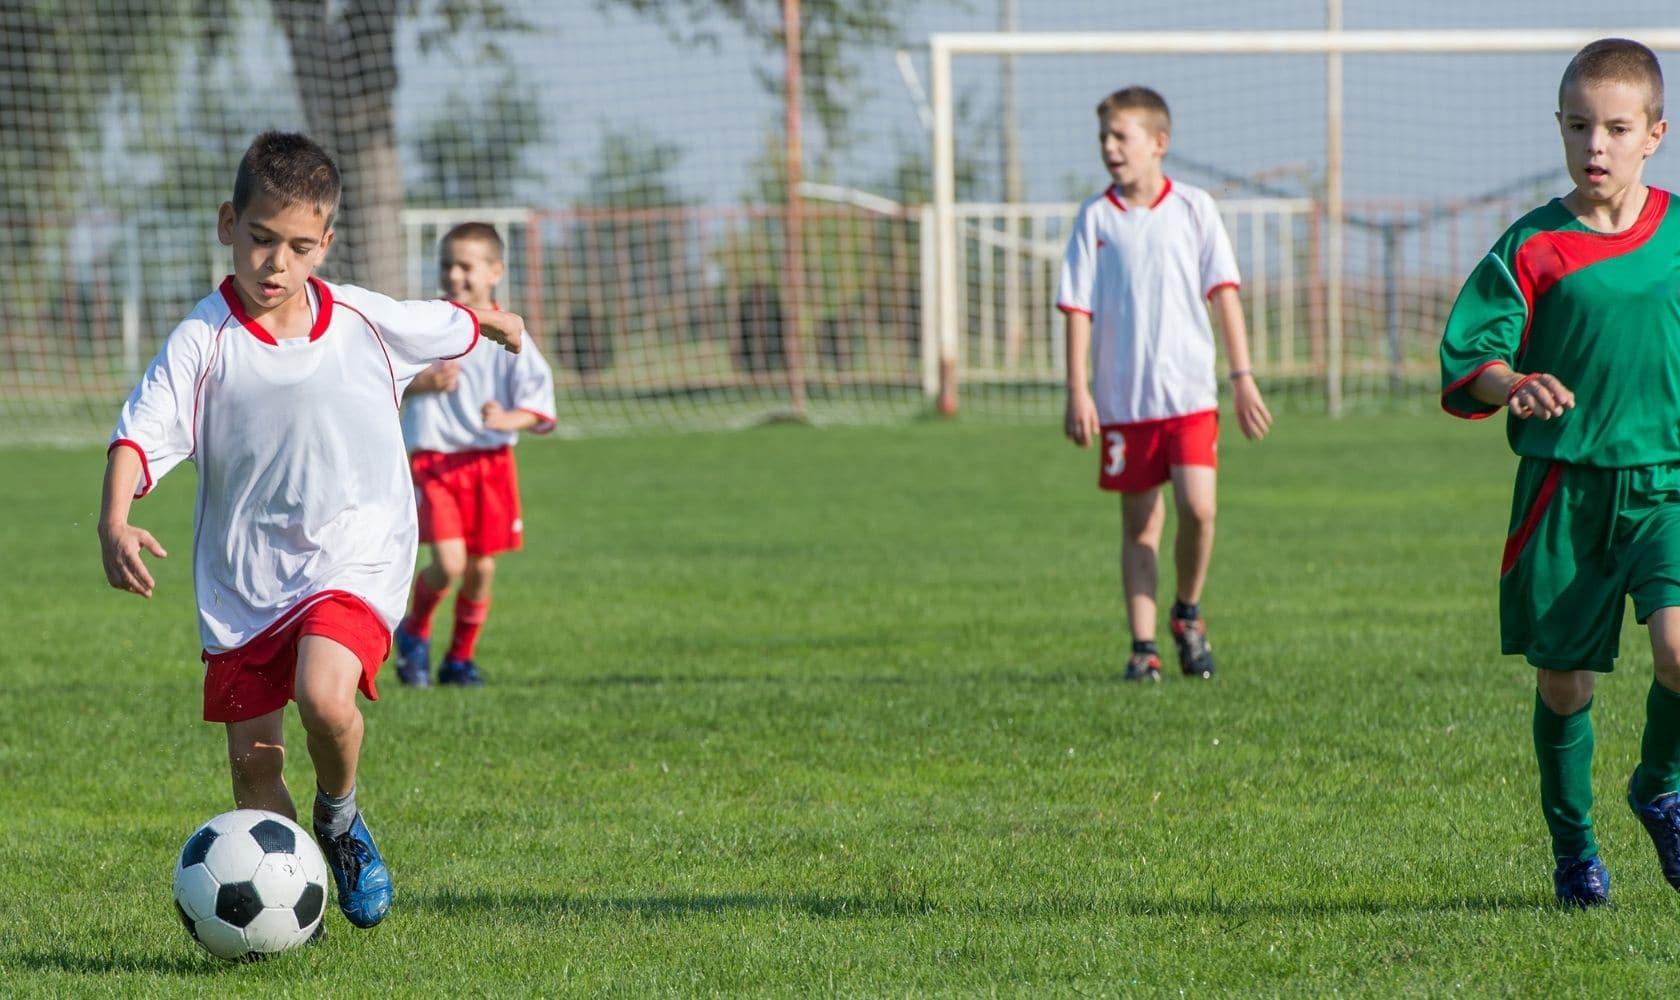 How to coach U6 soccer: A definitive guide to coaching U6 soccer drills.